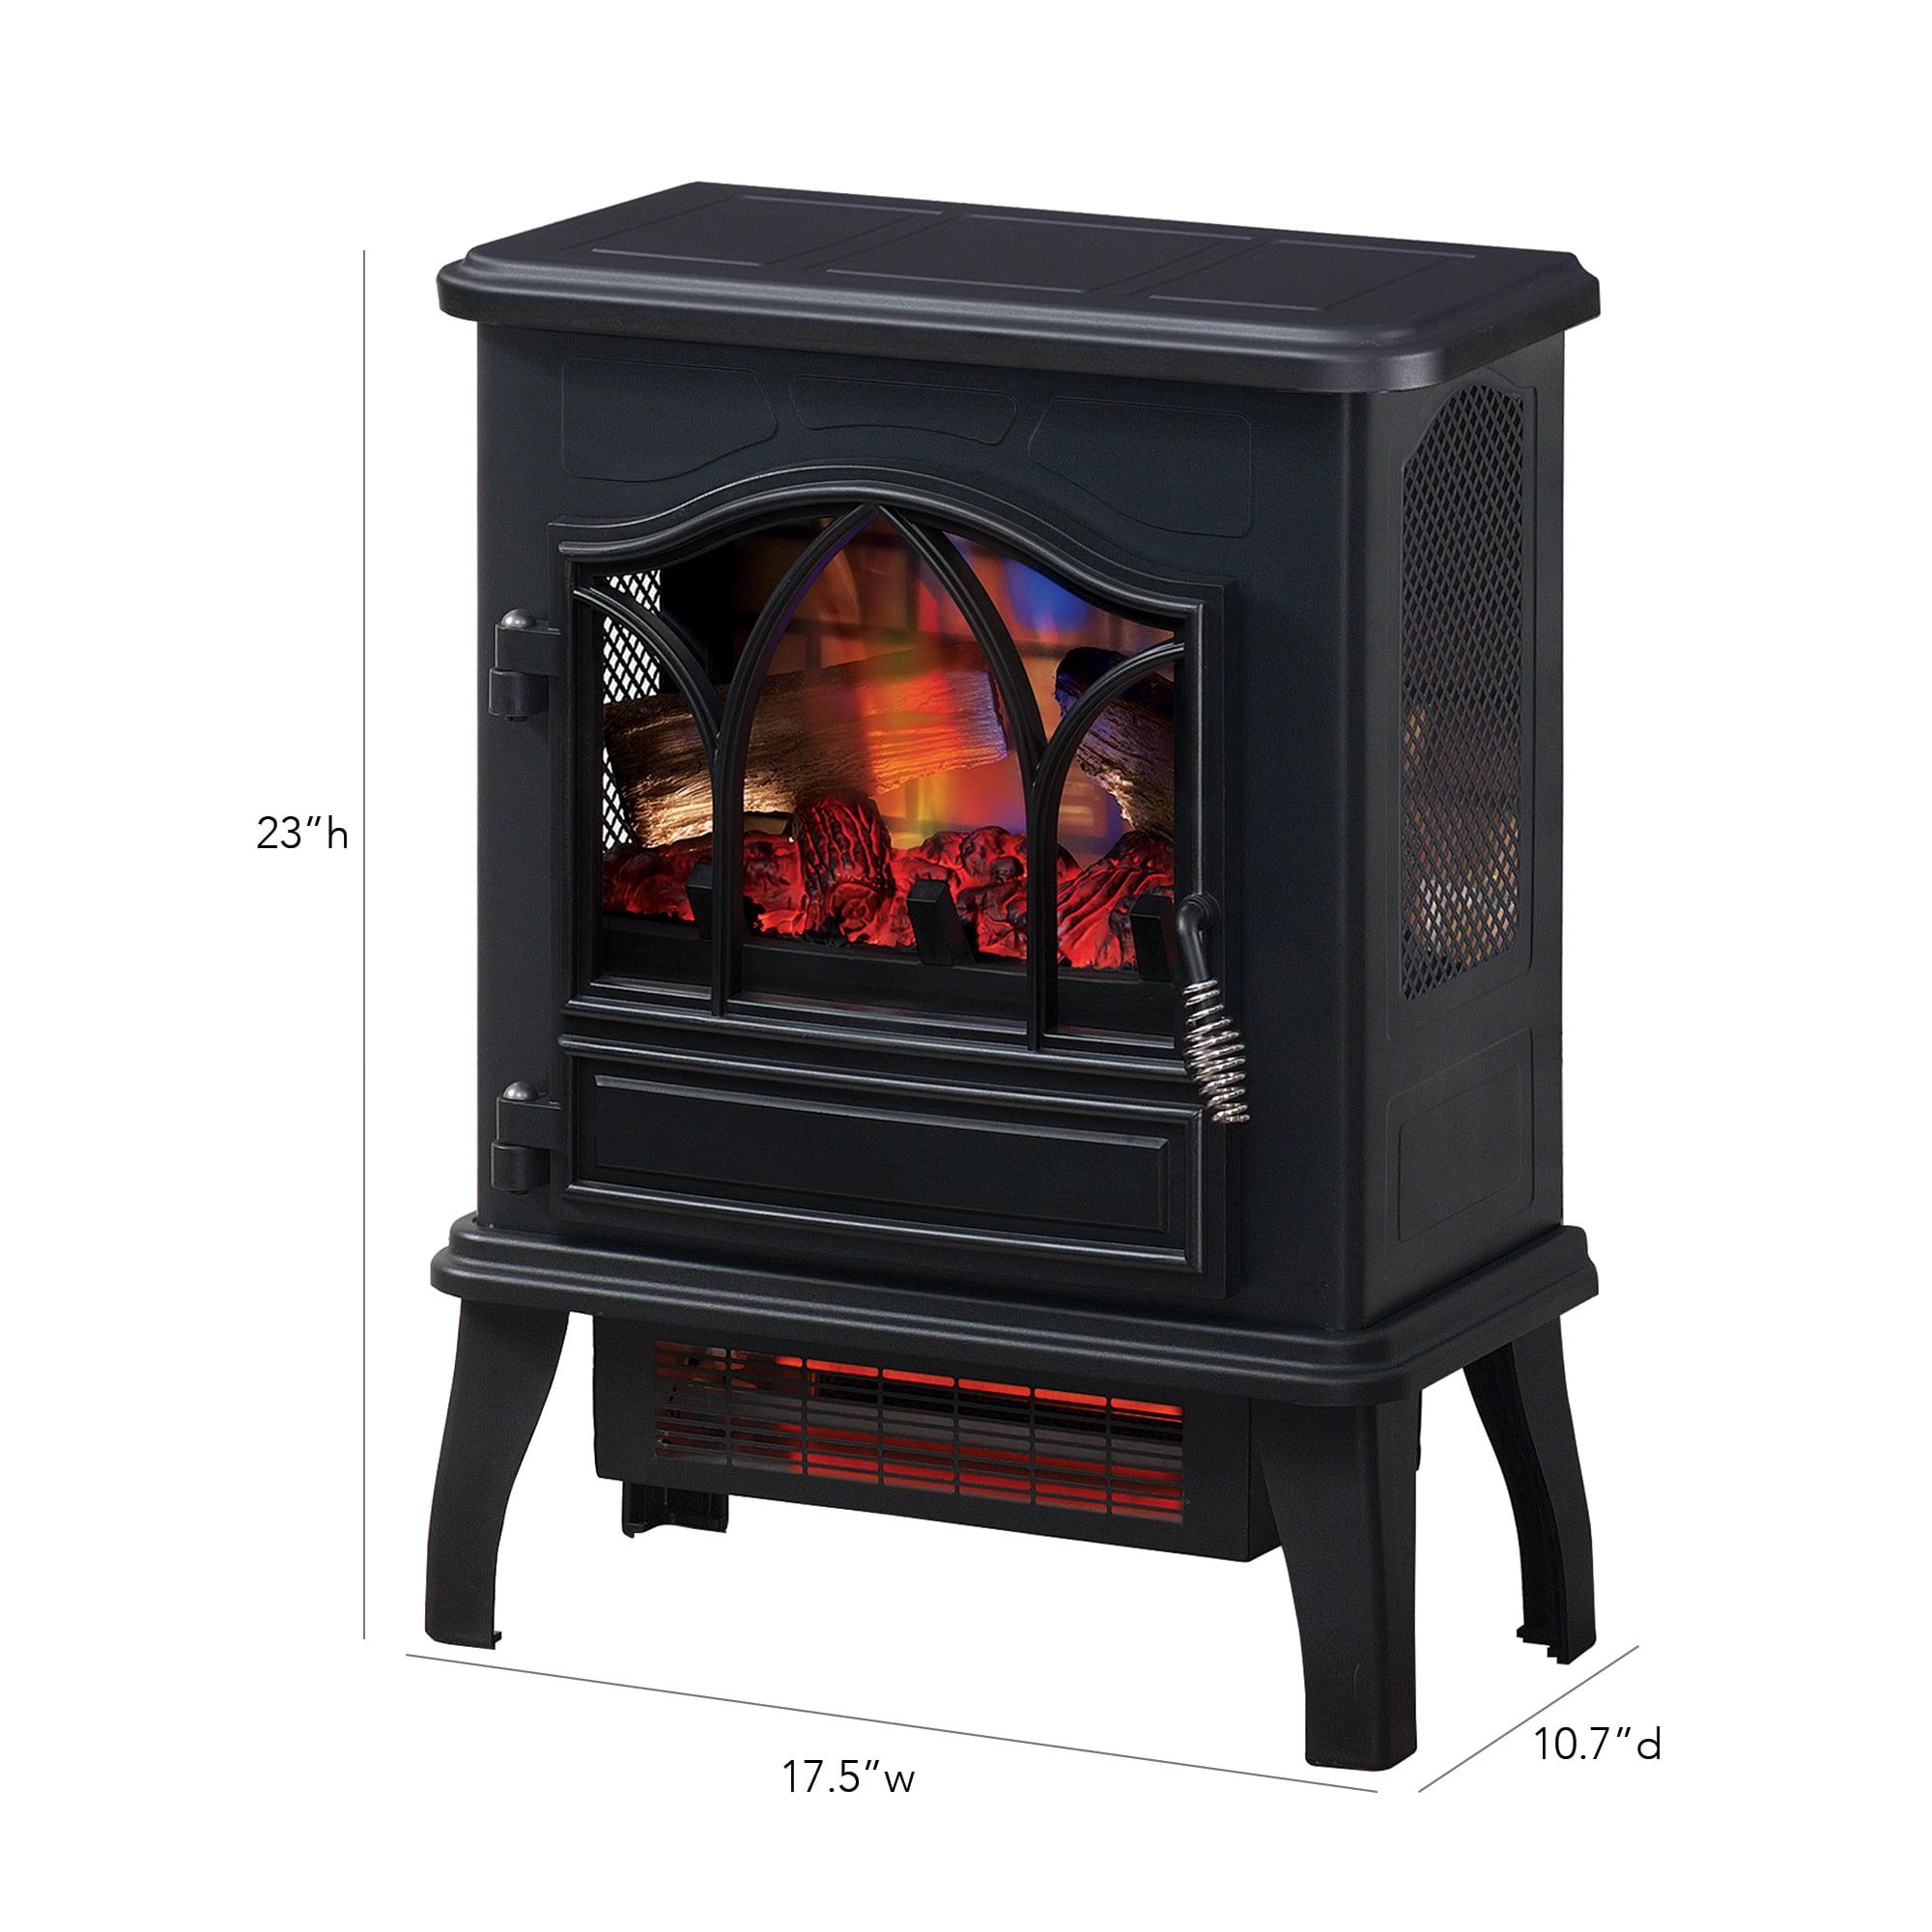 3d infrared quartz electric fireplace stove black walmart com rh walmart com